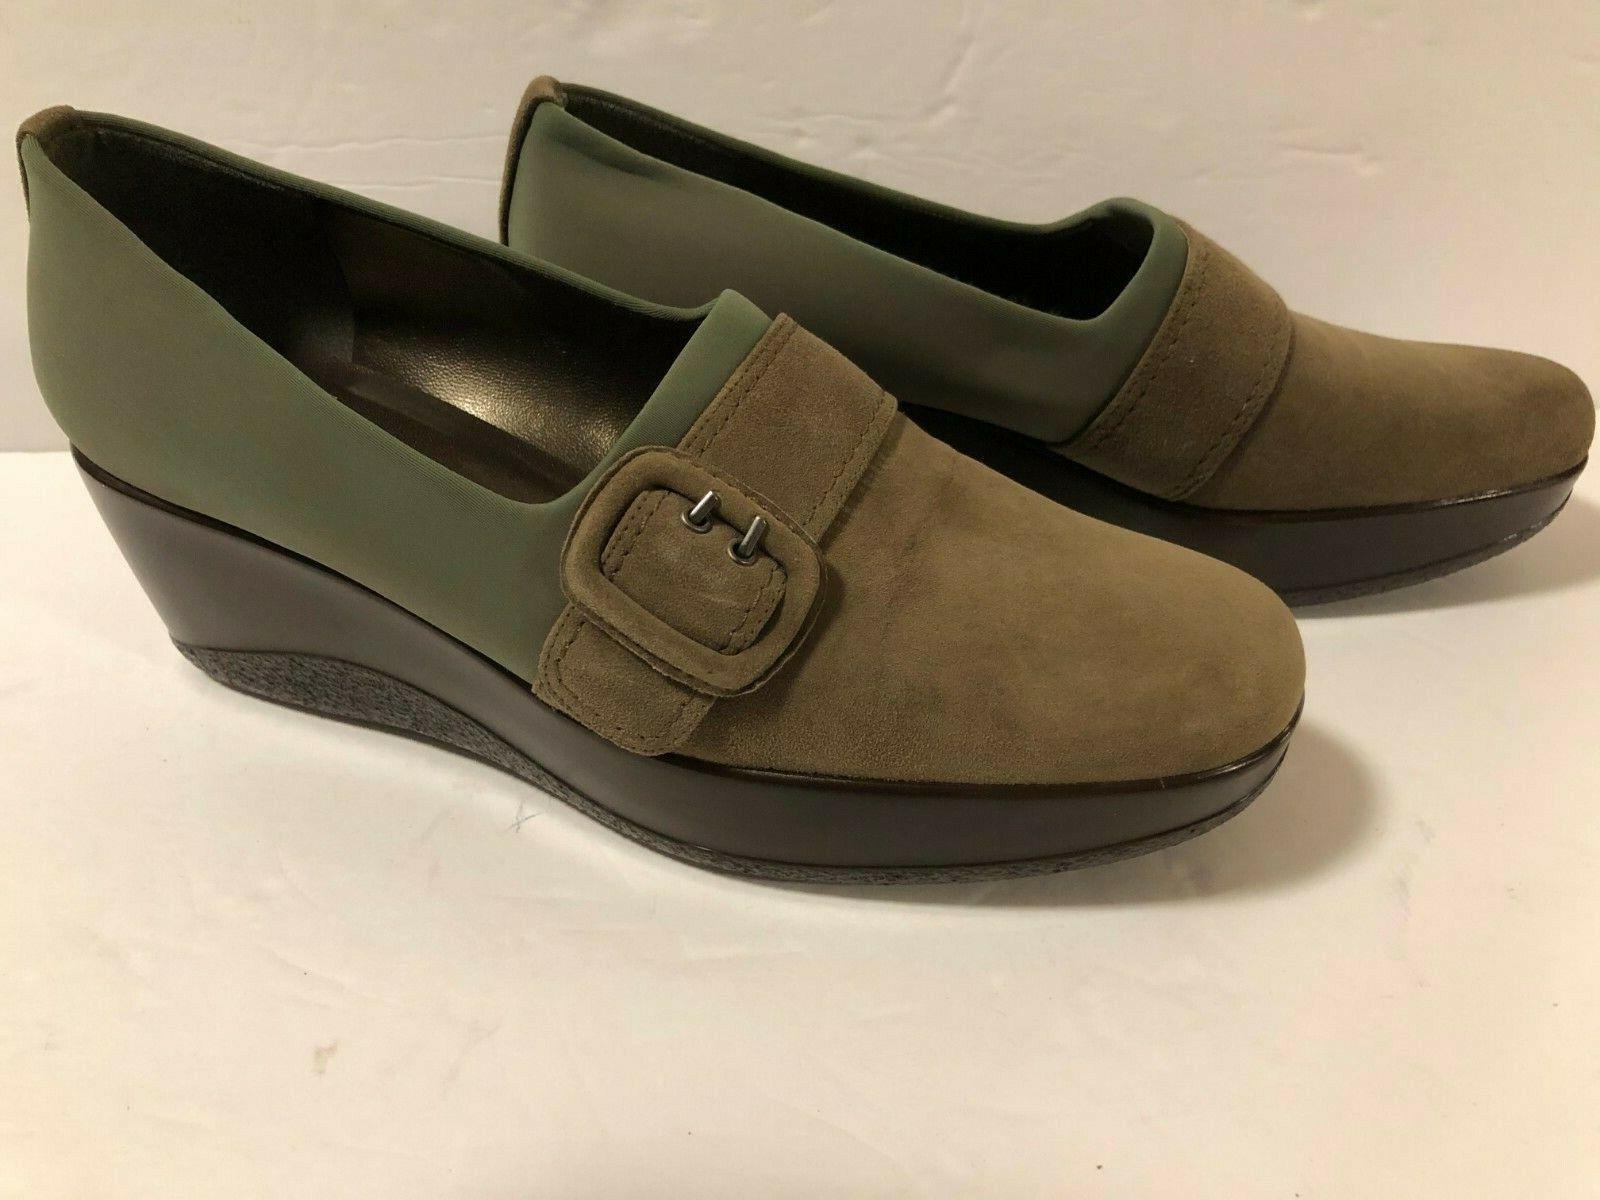 STUART WEITZMAN shoes Wedge Buckle Taupe Suede Green Nylon EUC Size 8 1 2